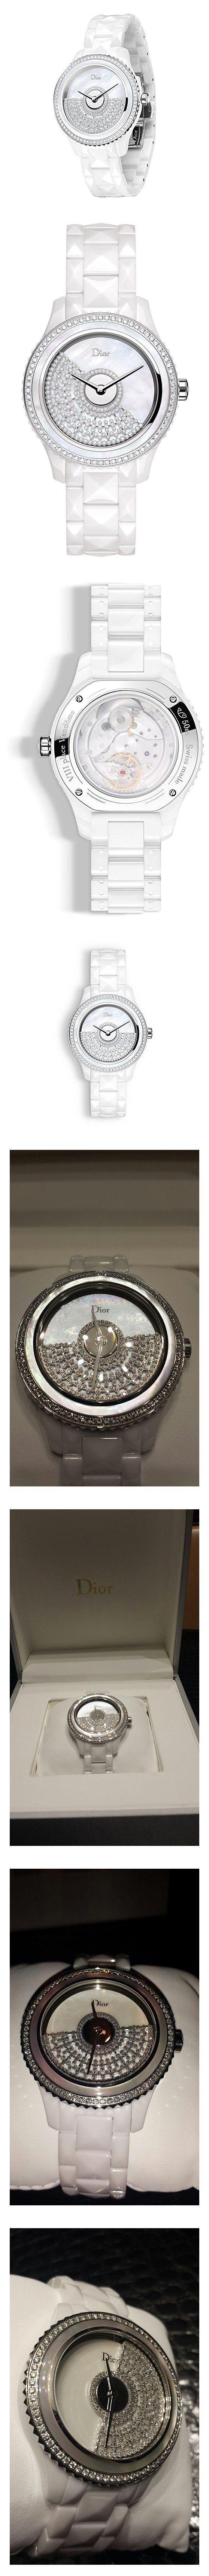 Haute Couture Diva Millionaire Dior GRAND BAL set with Pavee Diamonds #watch #christiandior #wrist_watches #watches #women #departments #shops